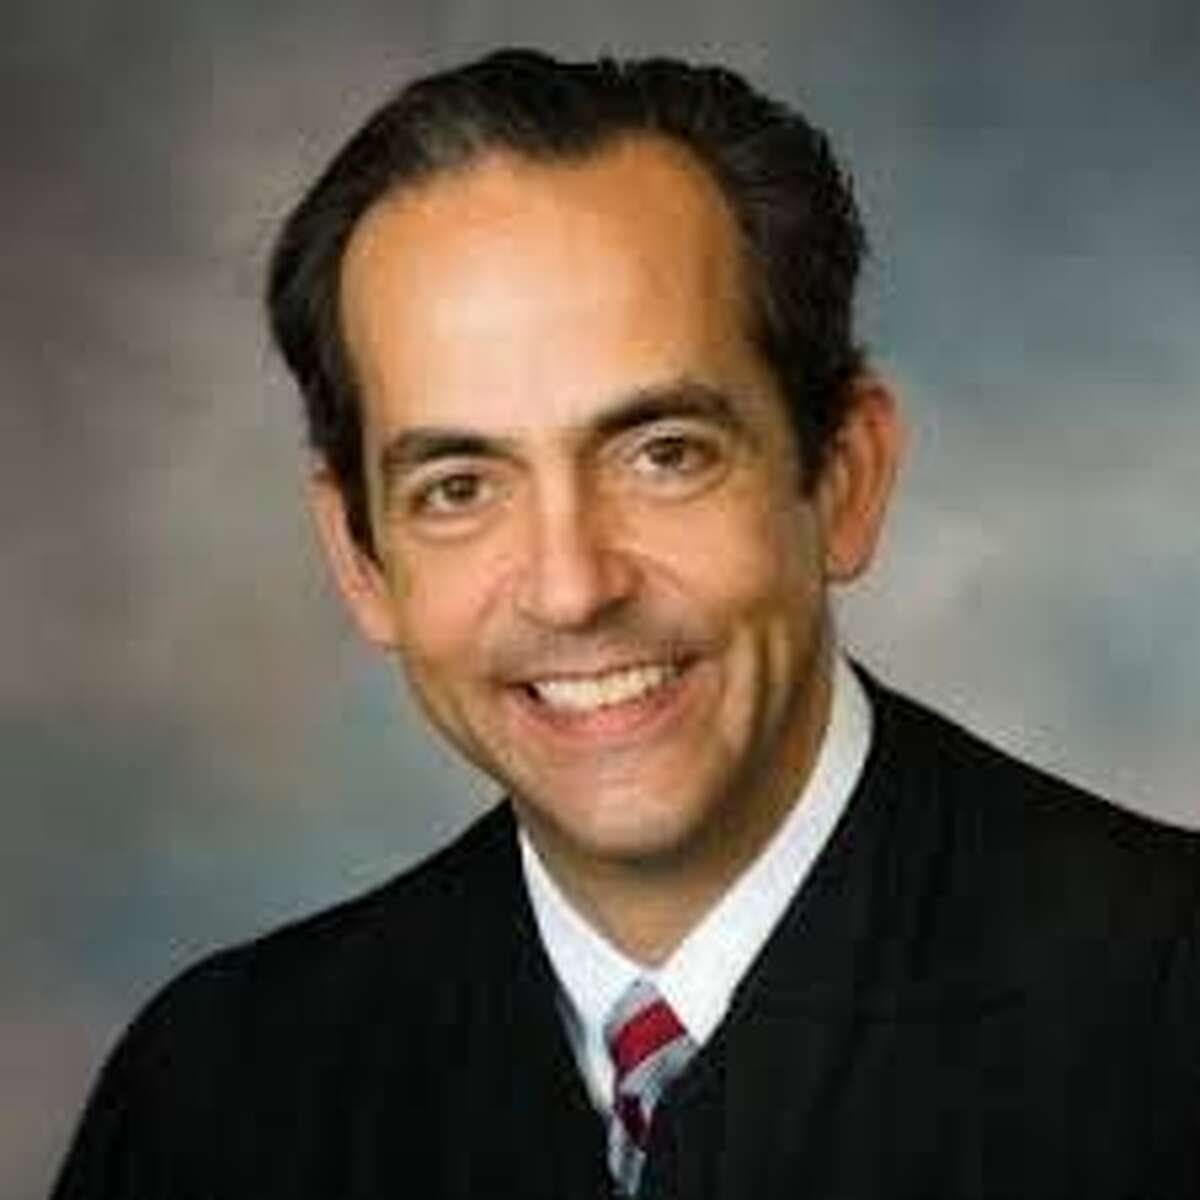 Midland County Circuit Court Judge Stephen P. Carras